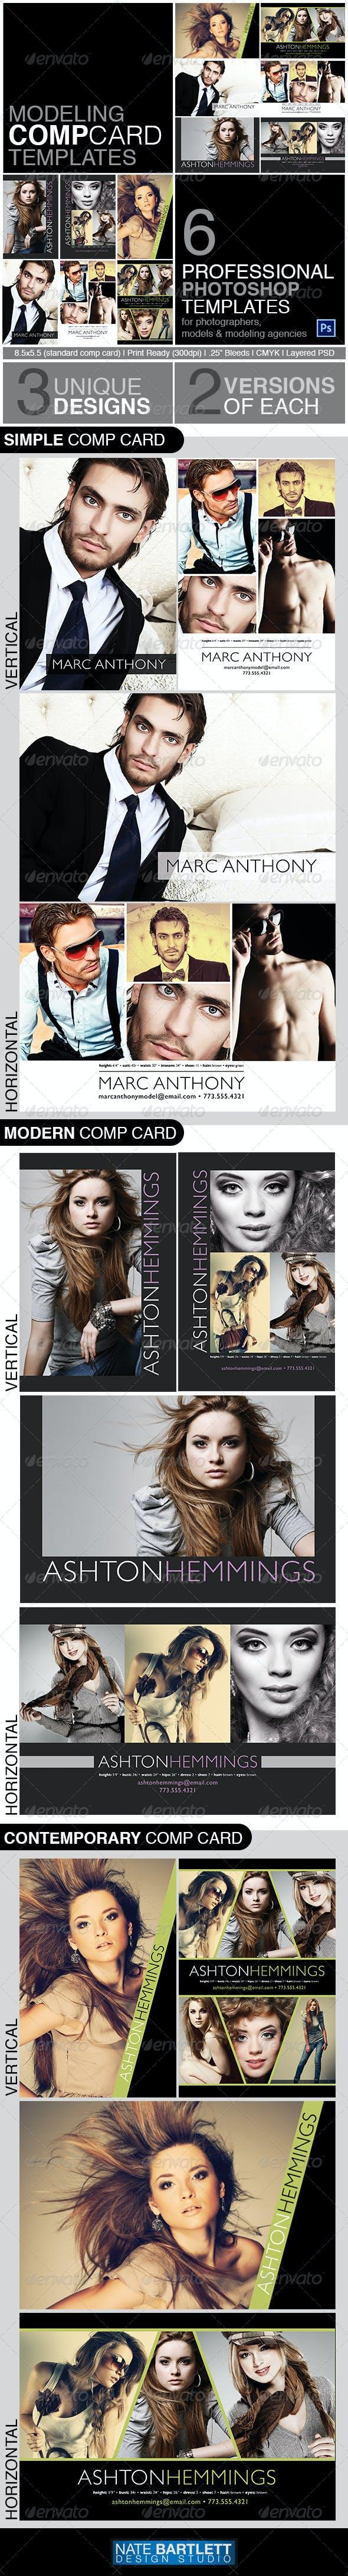 Model Comp Card Template Kit Miscellaneous Print Templates